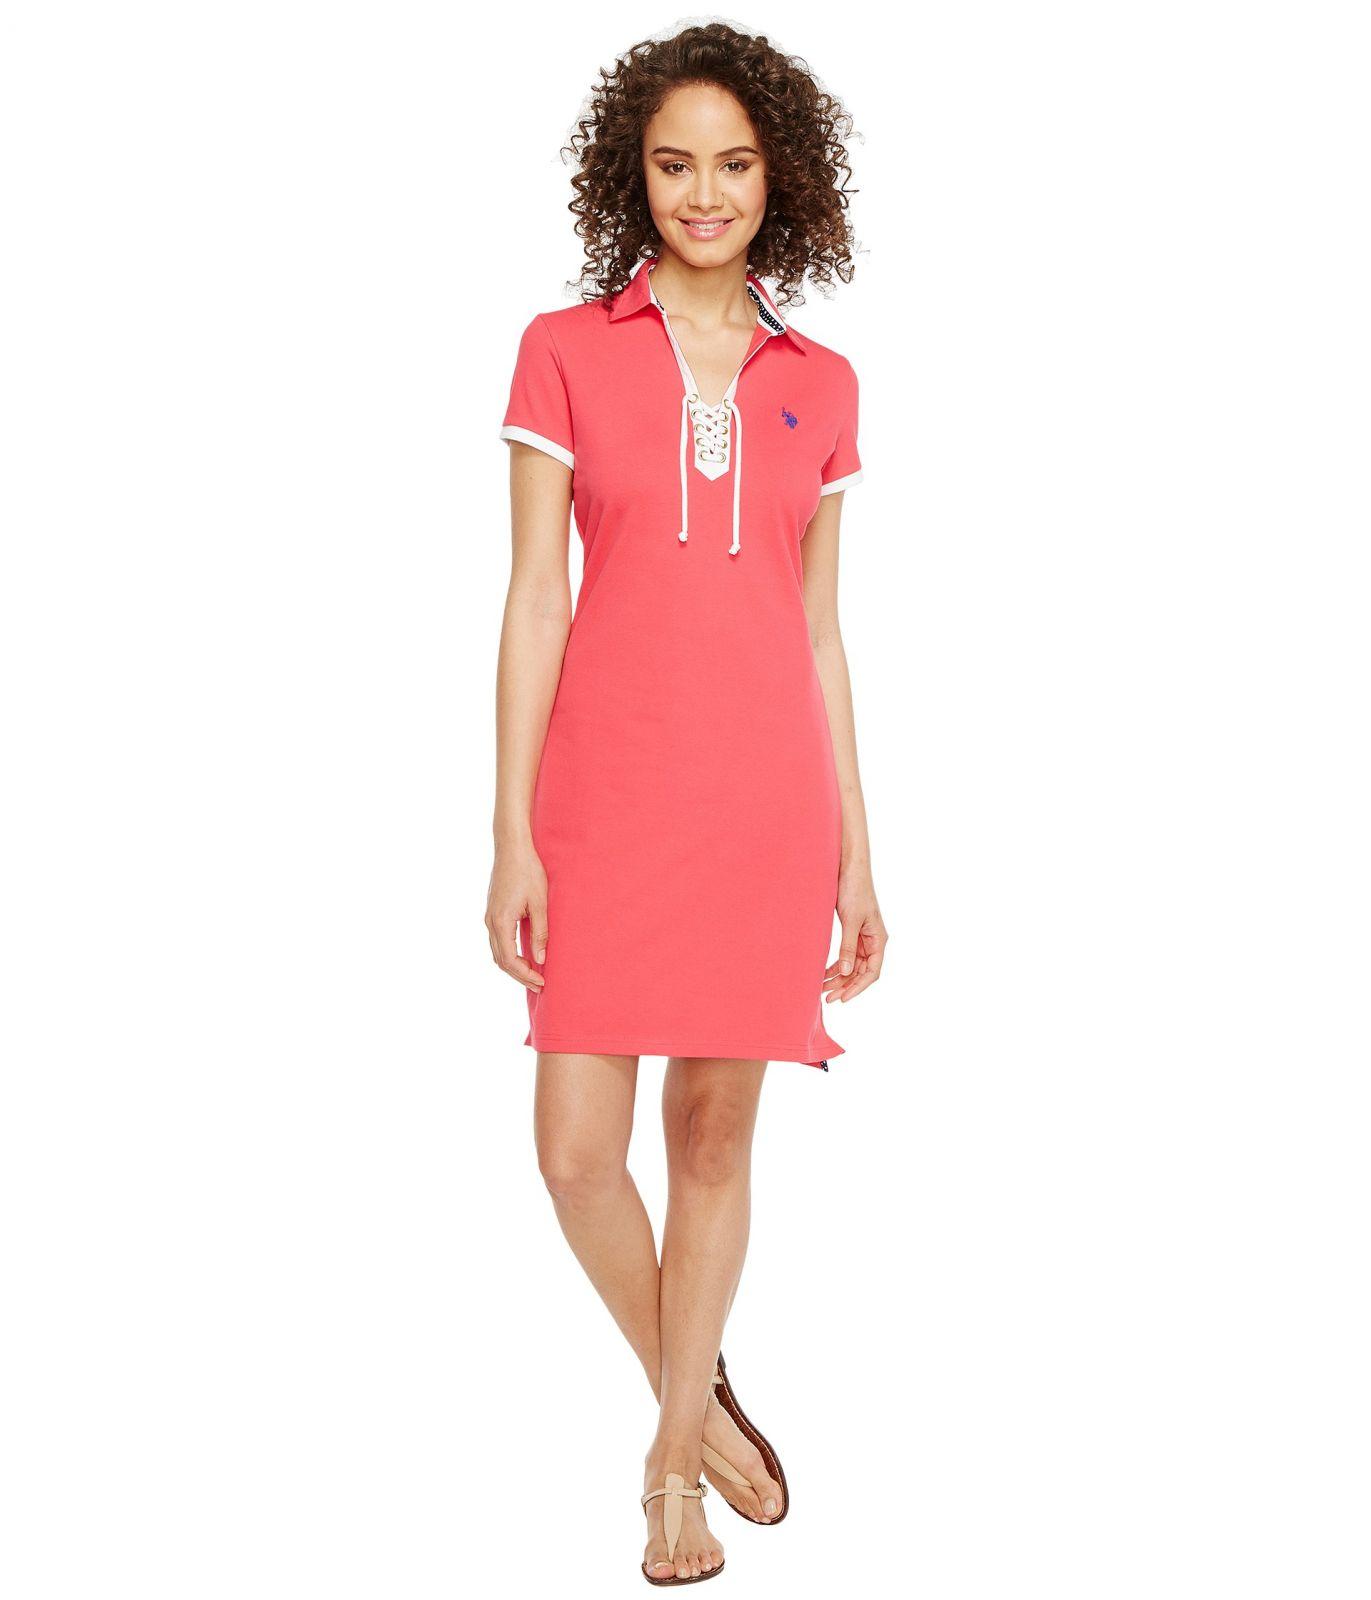 U.S. Polo Assn šaty Lace-Up Pique Polo Dress barevná U.S. Polo Assn.